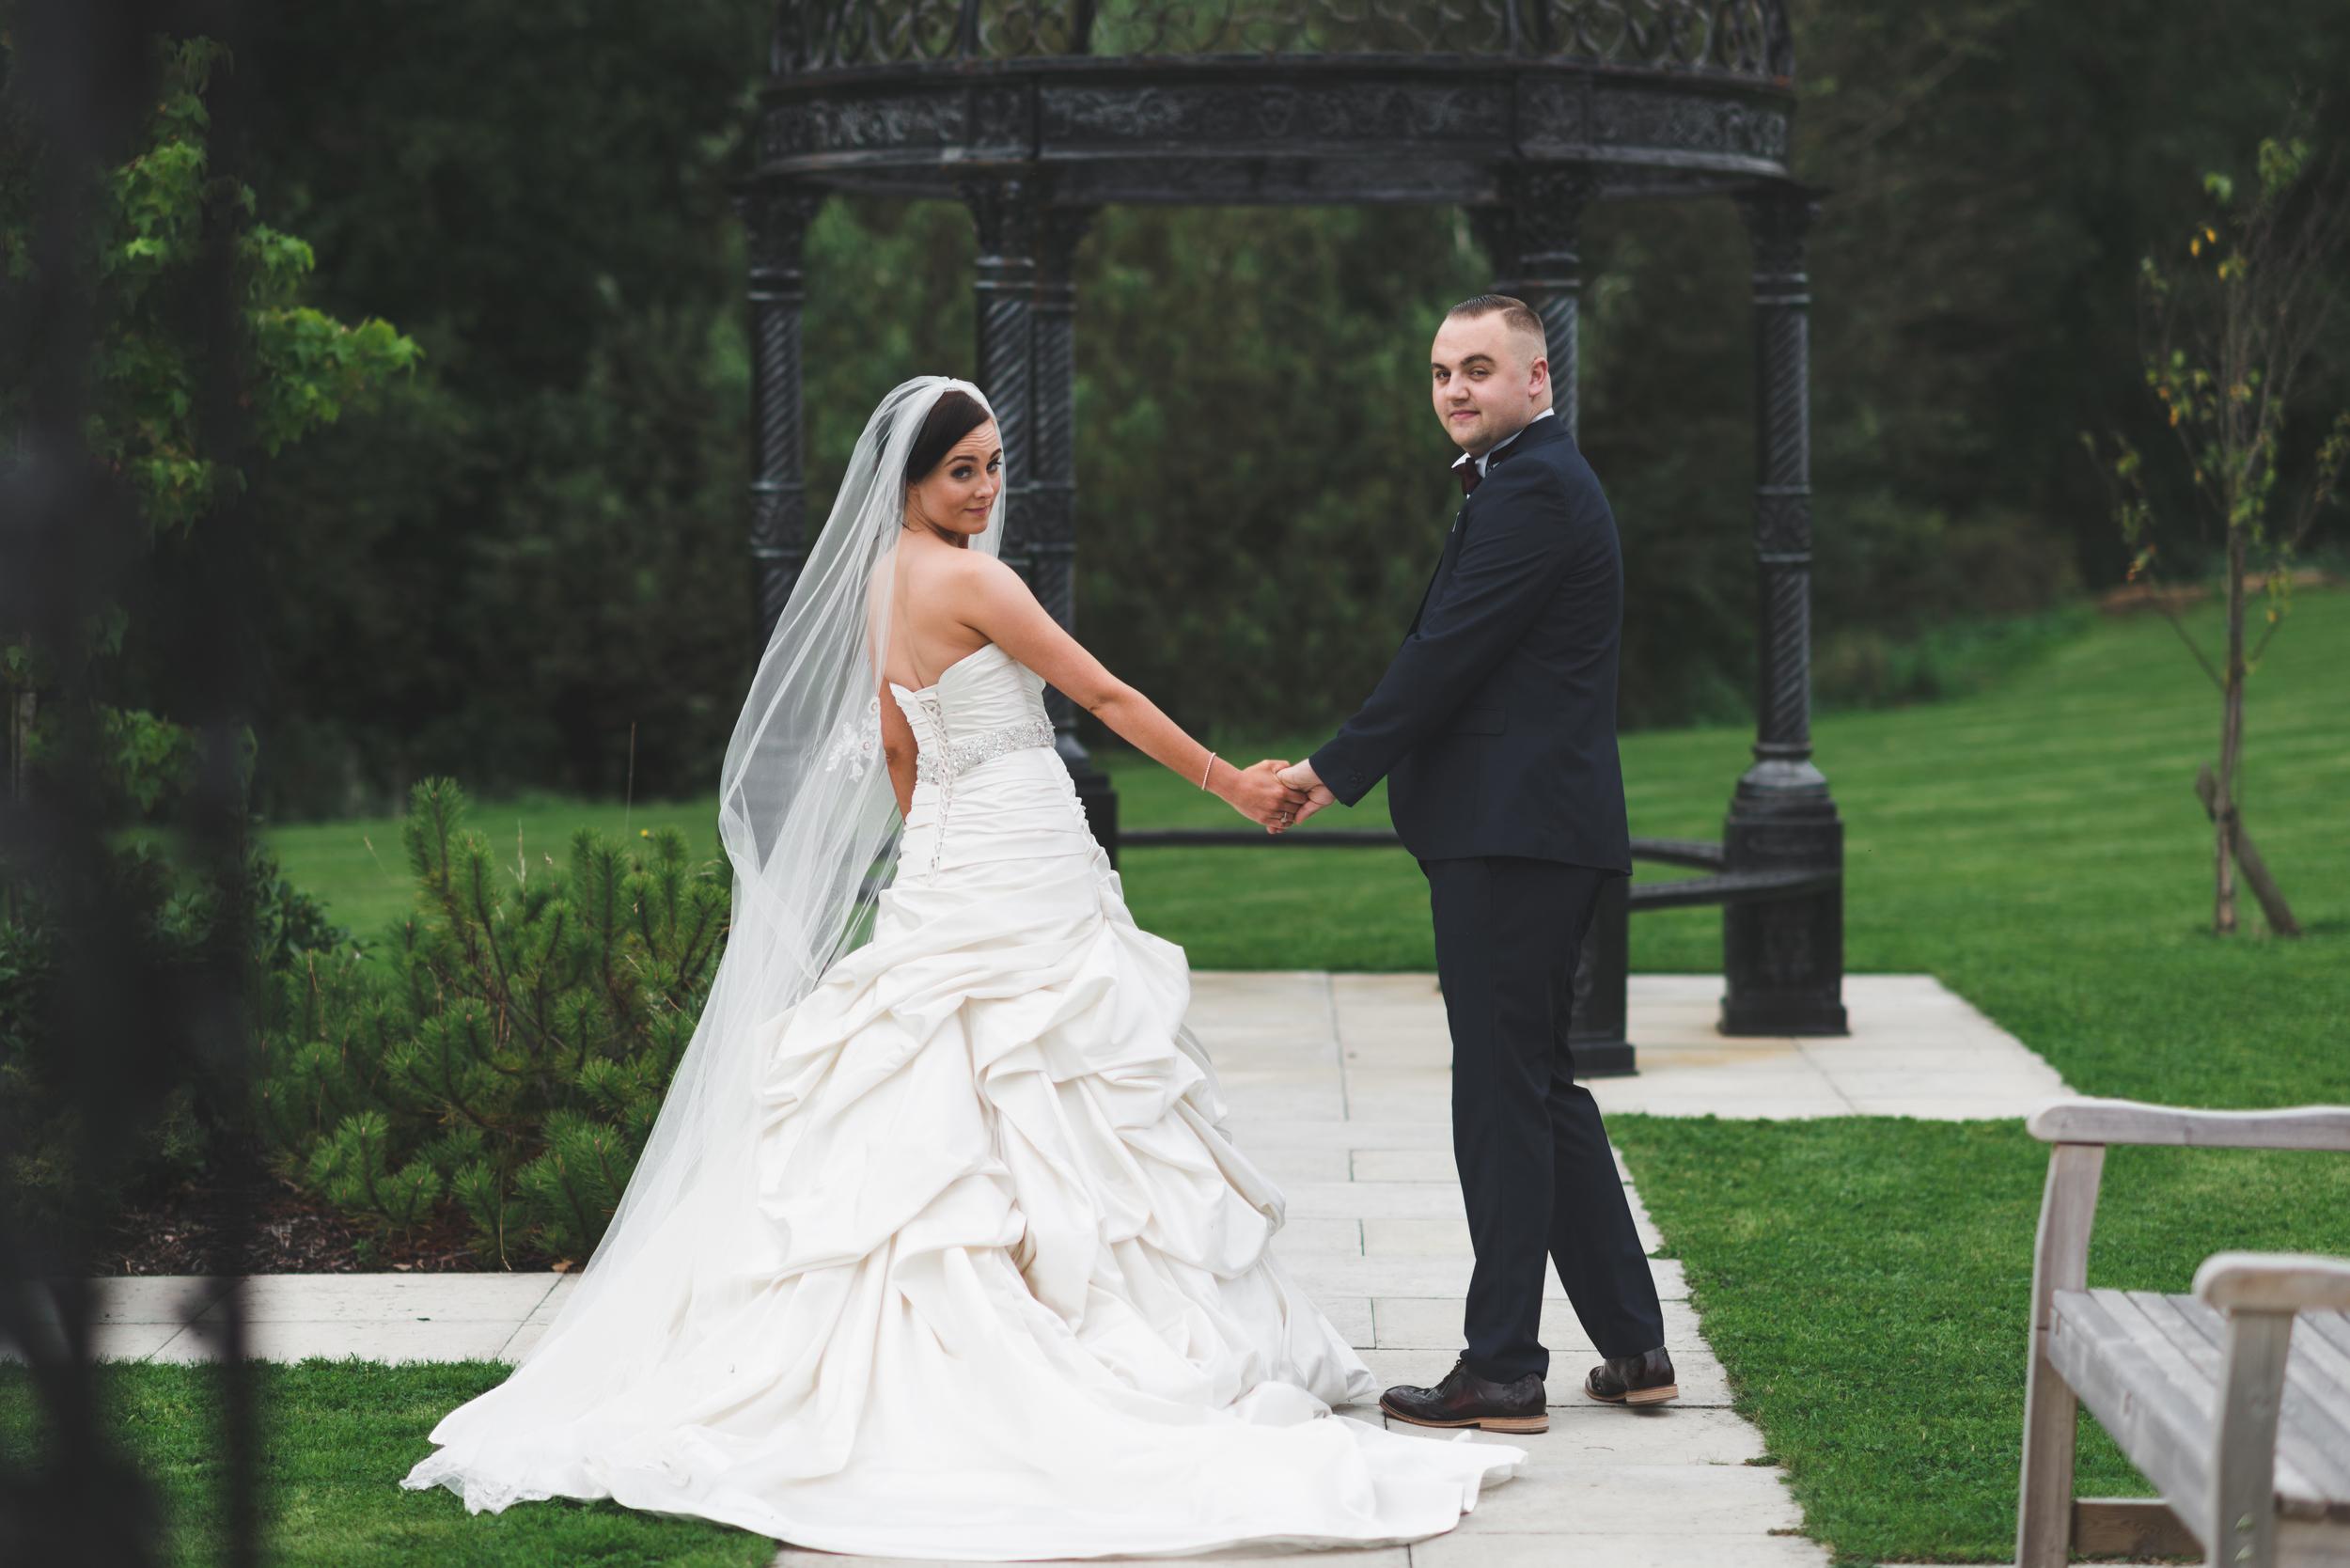 Northern_Ireland_Wedding_Photographer_Purephotoni_Dunsilly_Hotel_Walking_Away